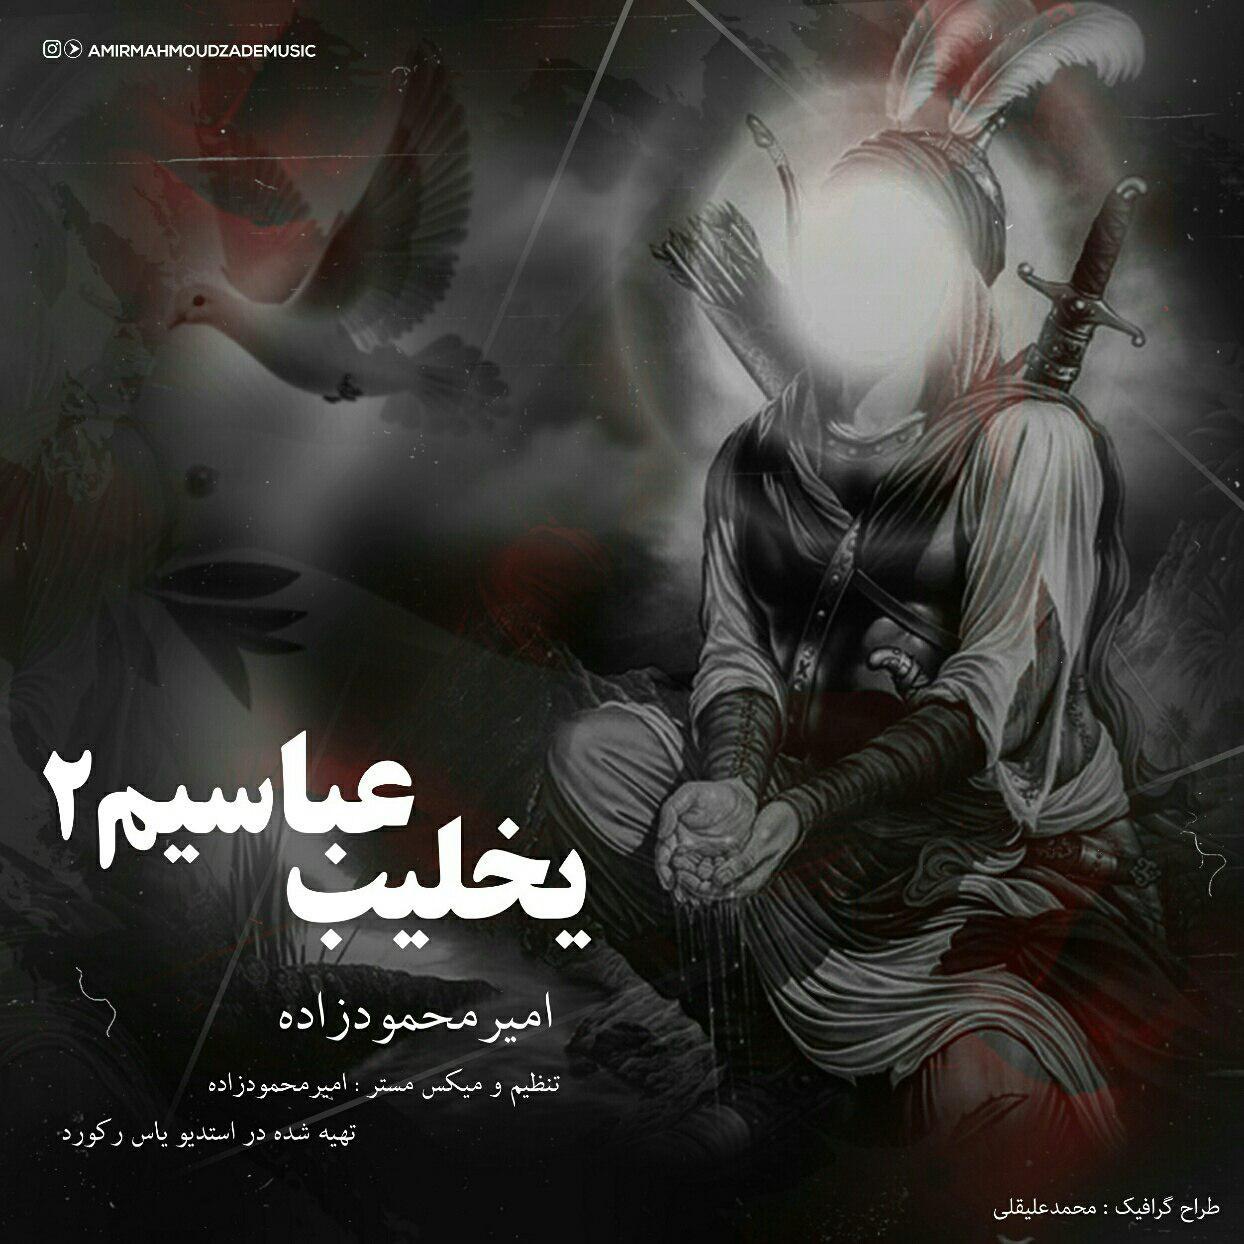 http://s6.picofile.com/file/8375652418/02Amir_Mahmoud_Zadeh_Yikhilib_Abbasim_2.jpg